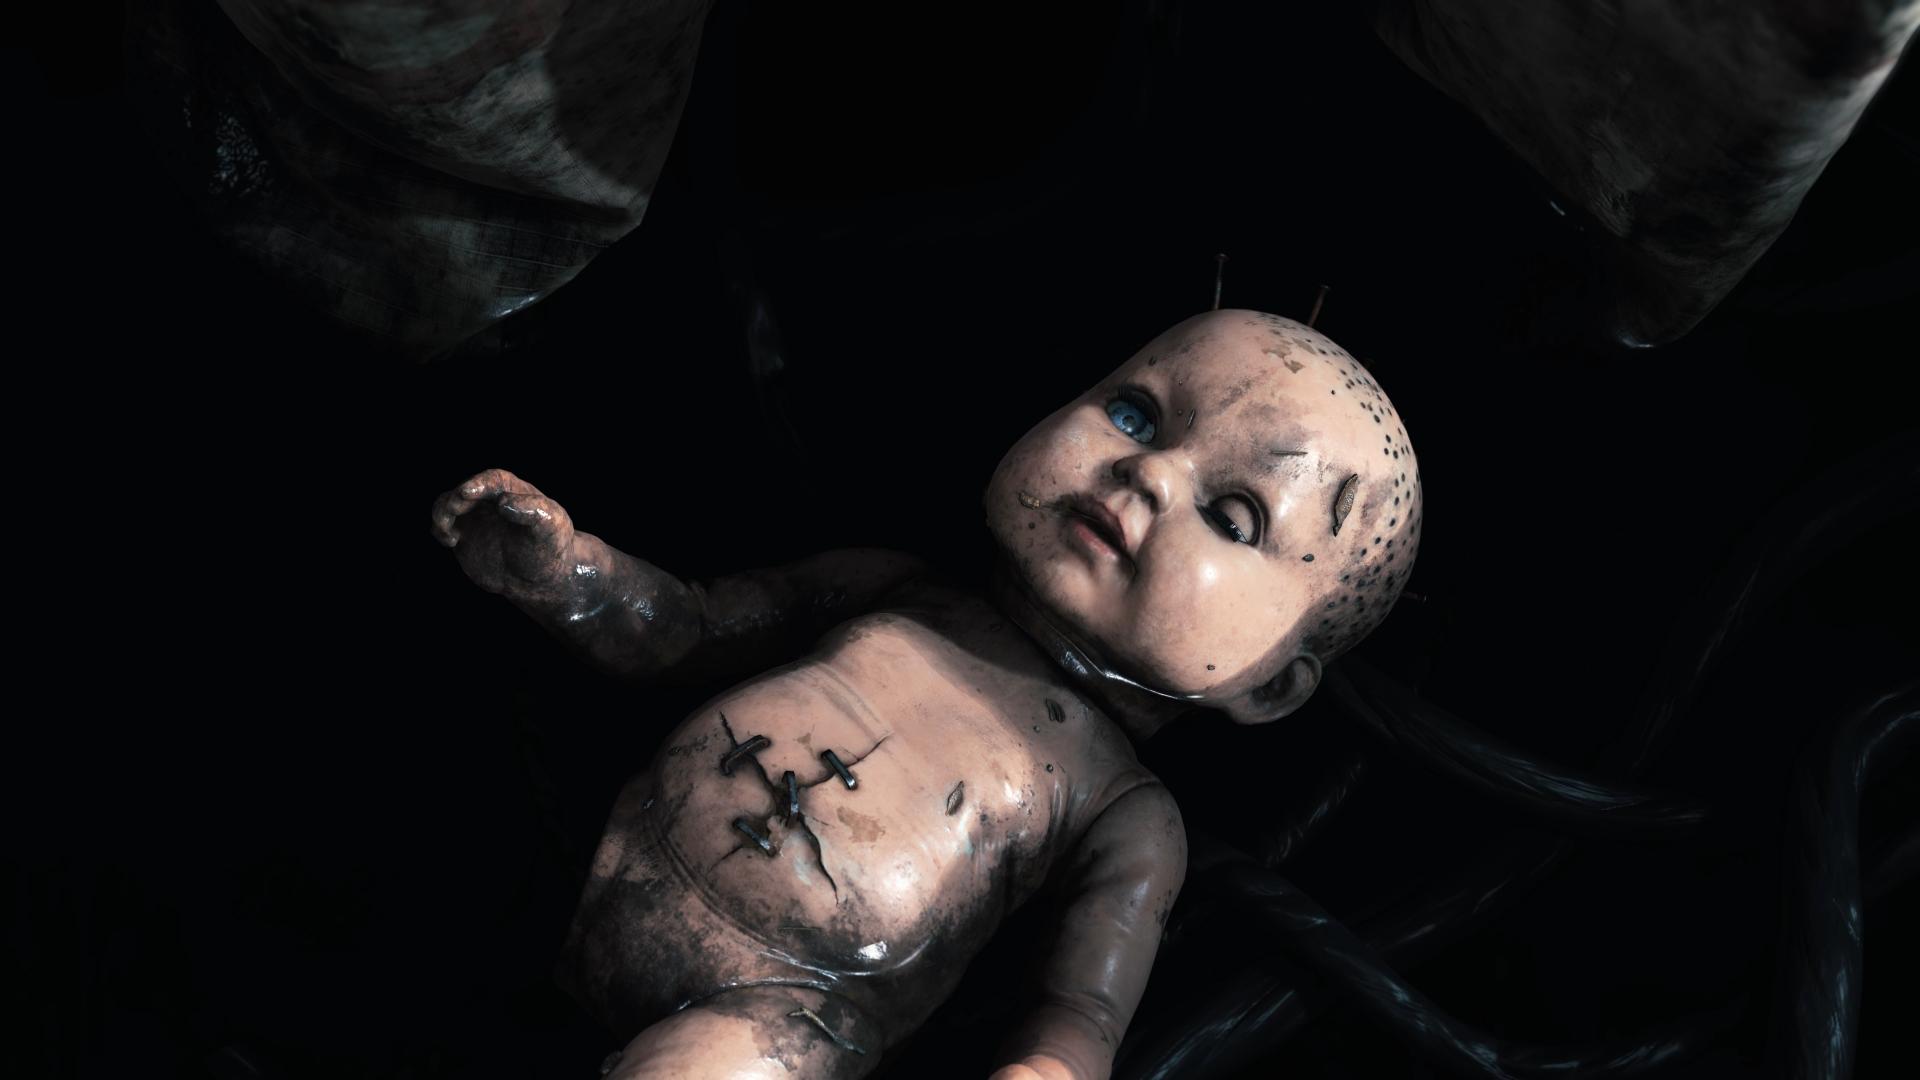 General 1920x1080 Death Stranding Hideo Kojima Kojima Productions creepy